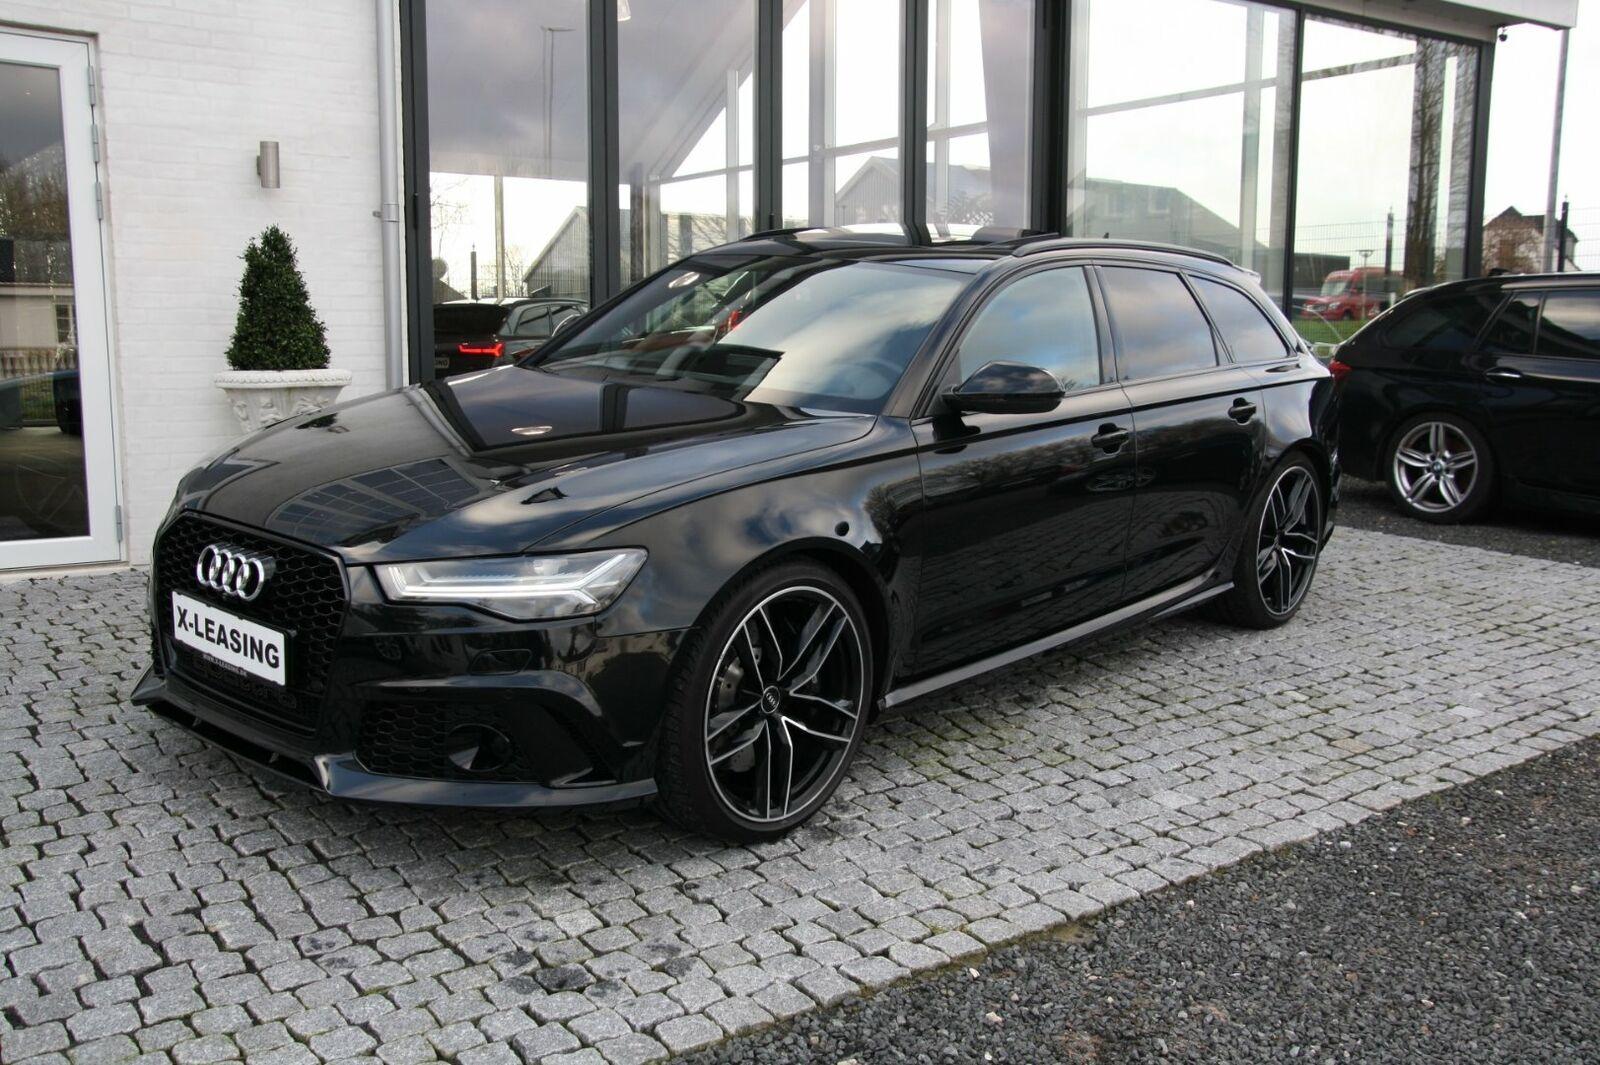 Audi RS6 4,0 TFSi Avant quattro Tiptr. 5d - 6.390 kr.